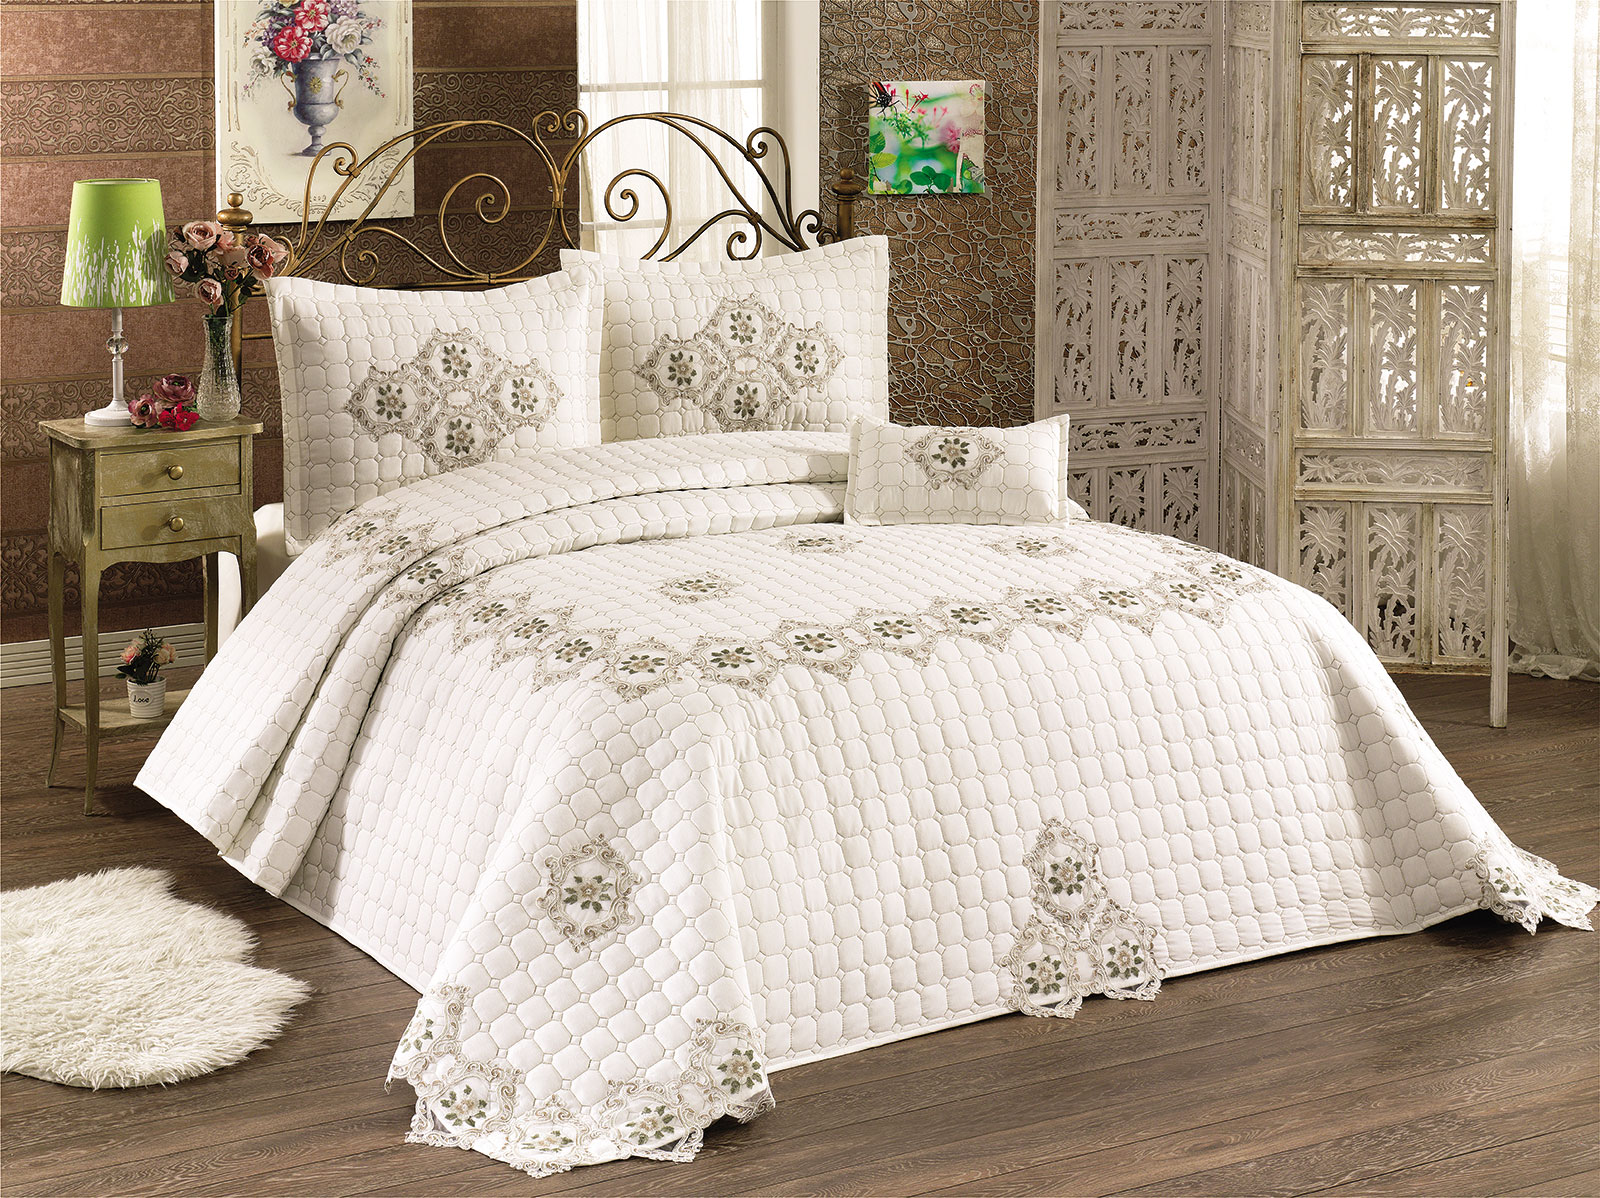 Quilted Bedspread Set